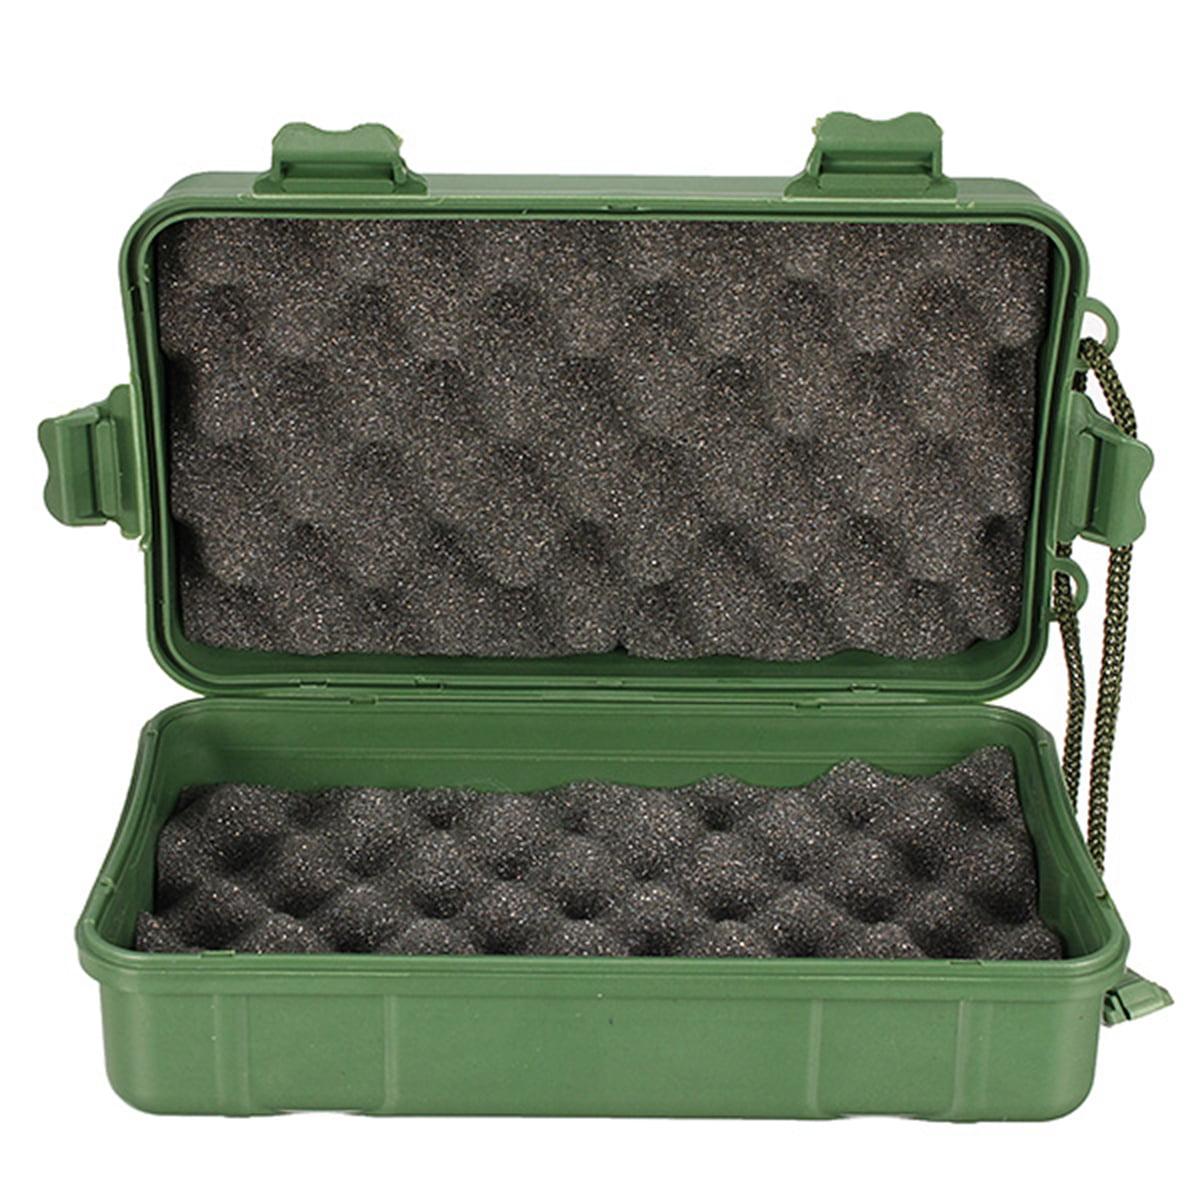 Green Plastic Box Case Storage For Flashlight Torch Lamp Light Headlight,18cm x 12cm x 5cm